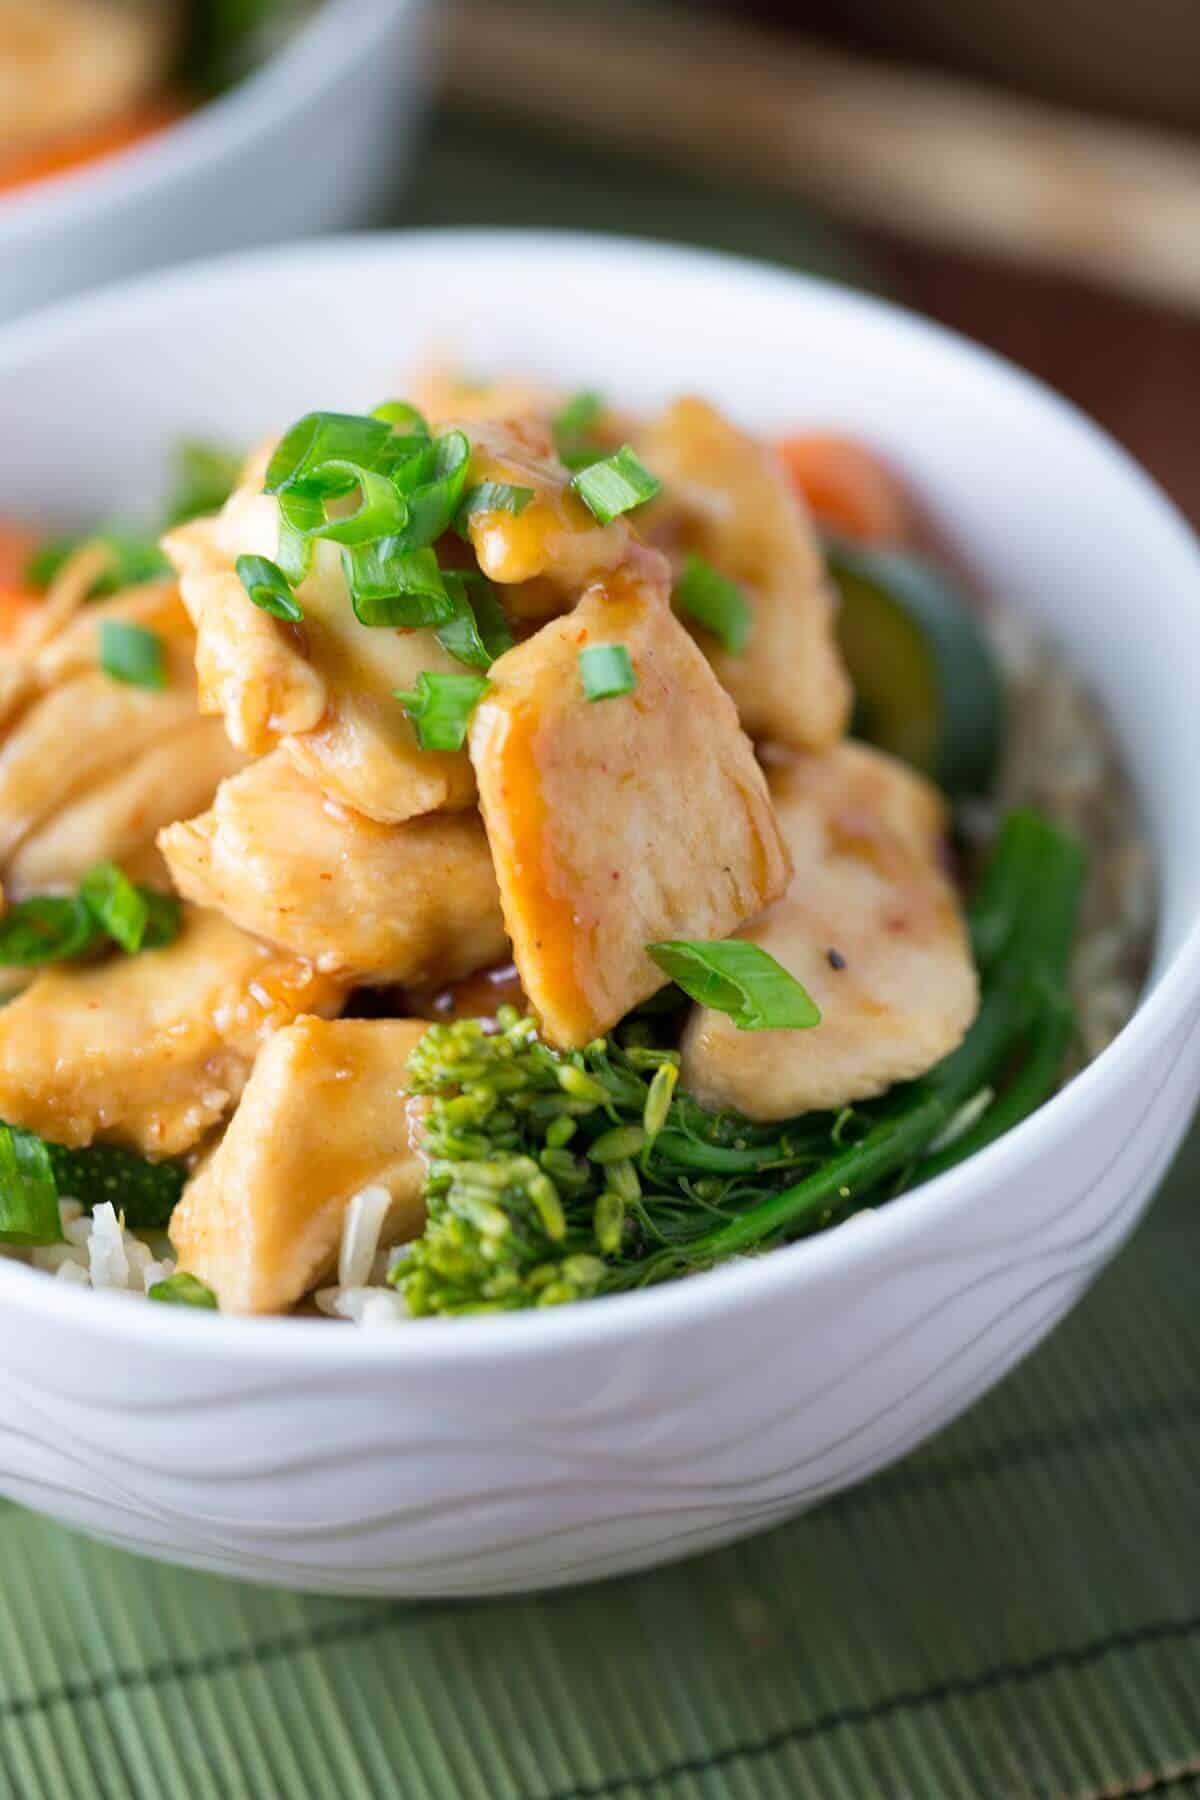 Golden honey spicy Sriracha stir-fry recipe